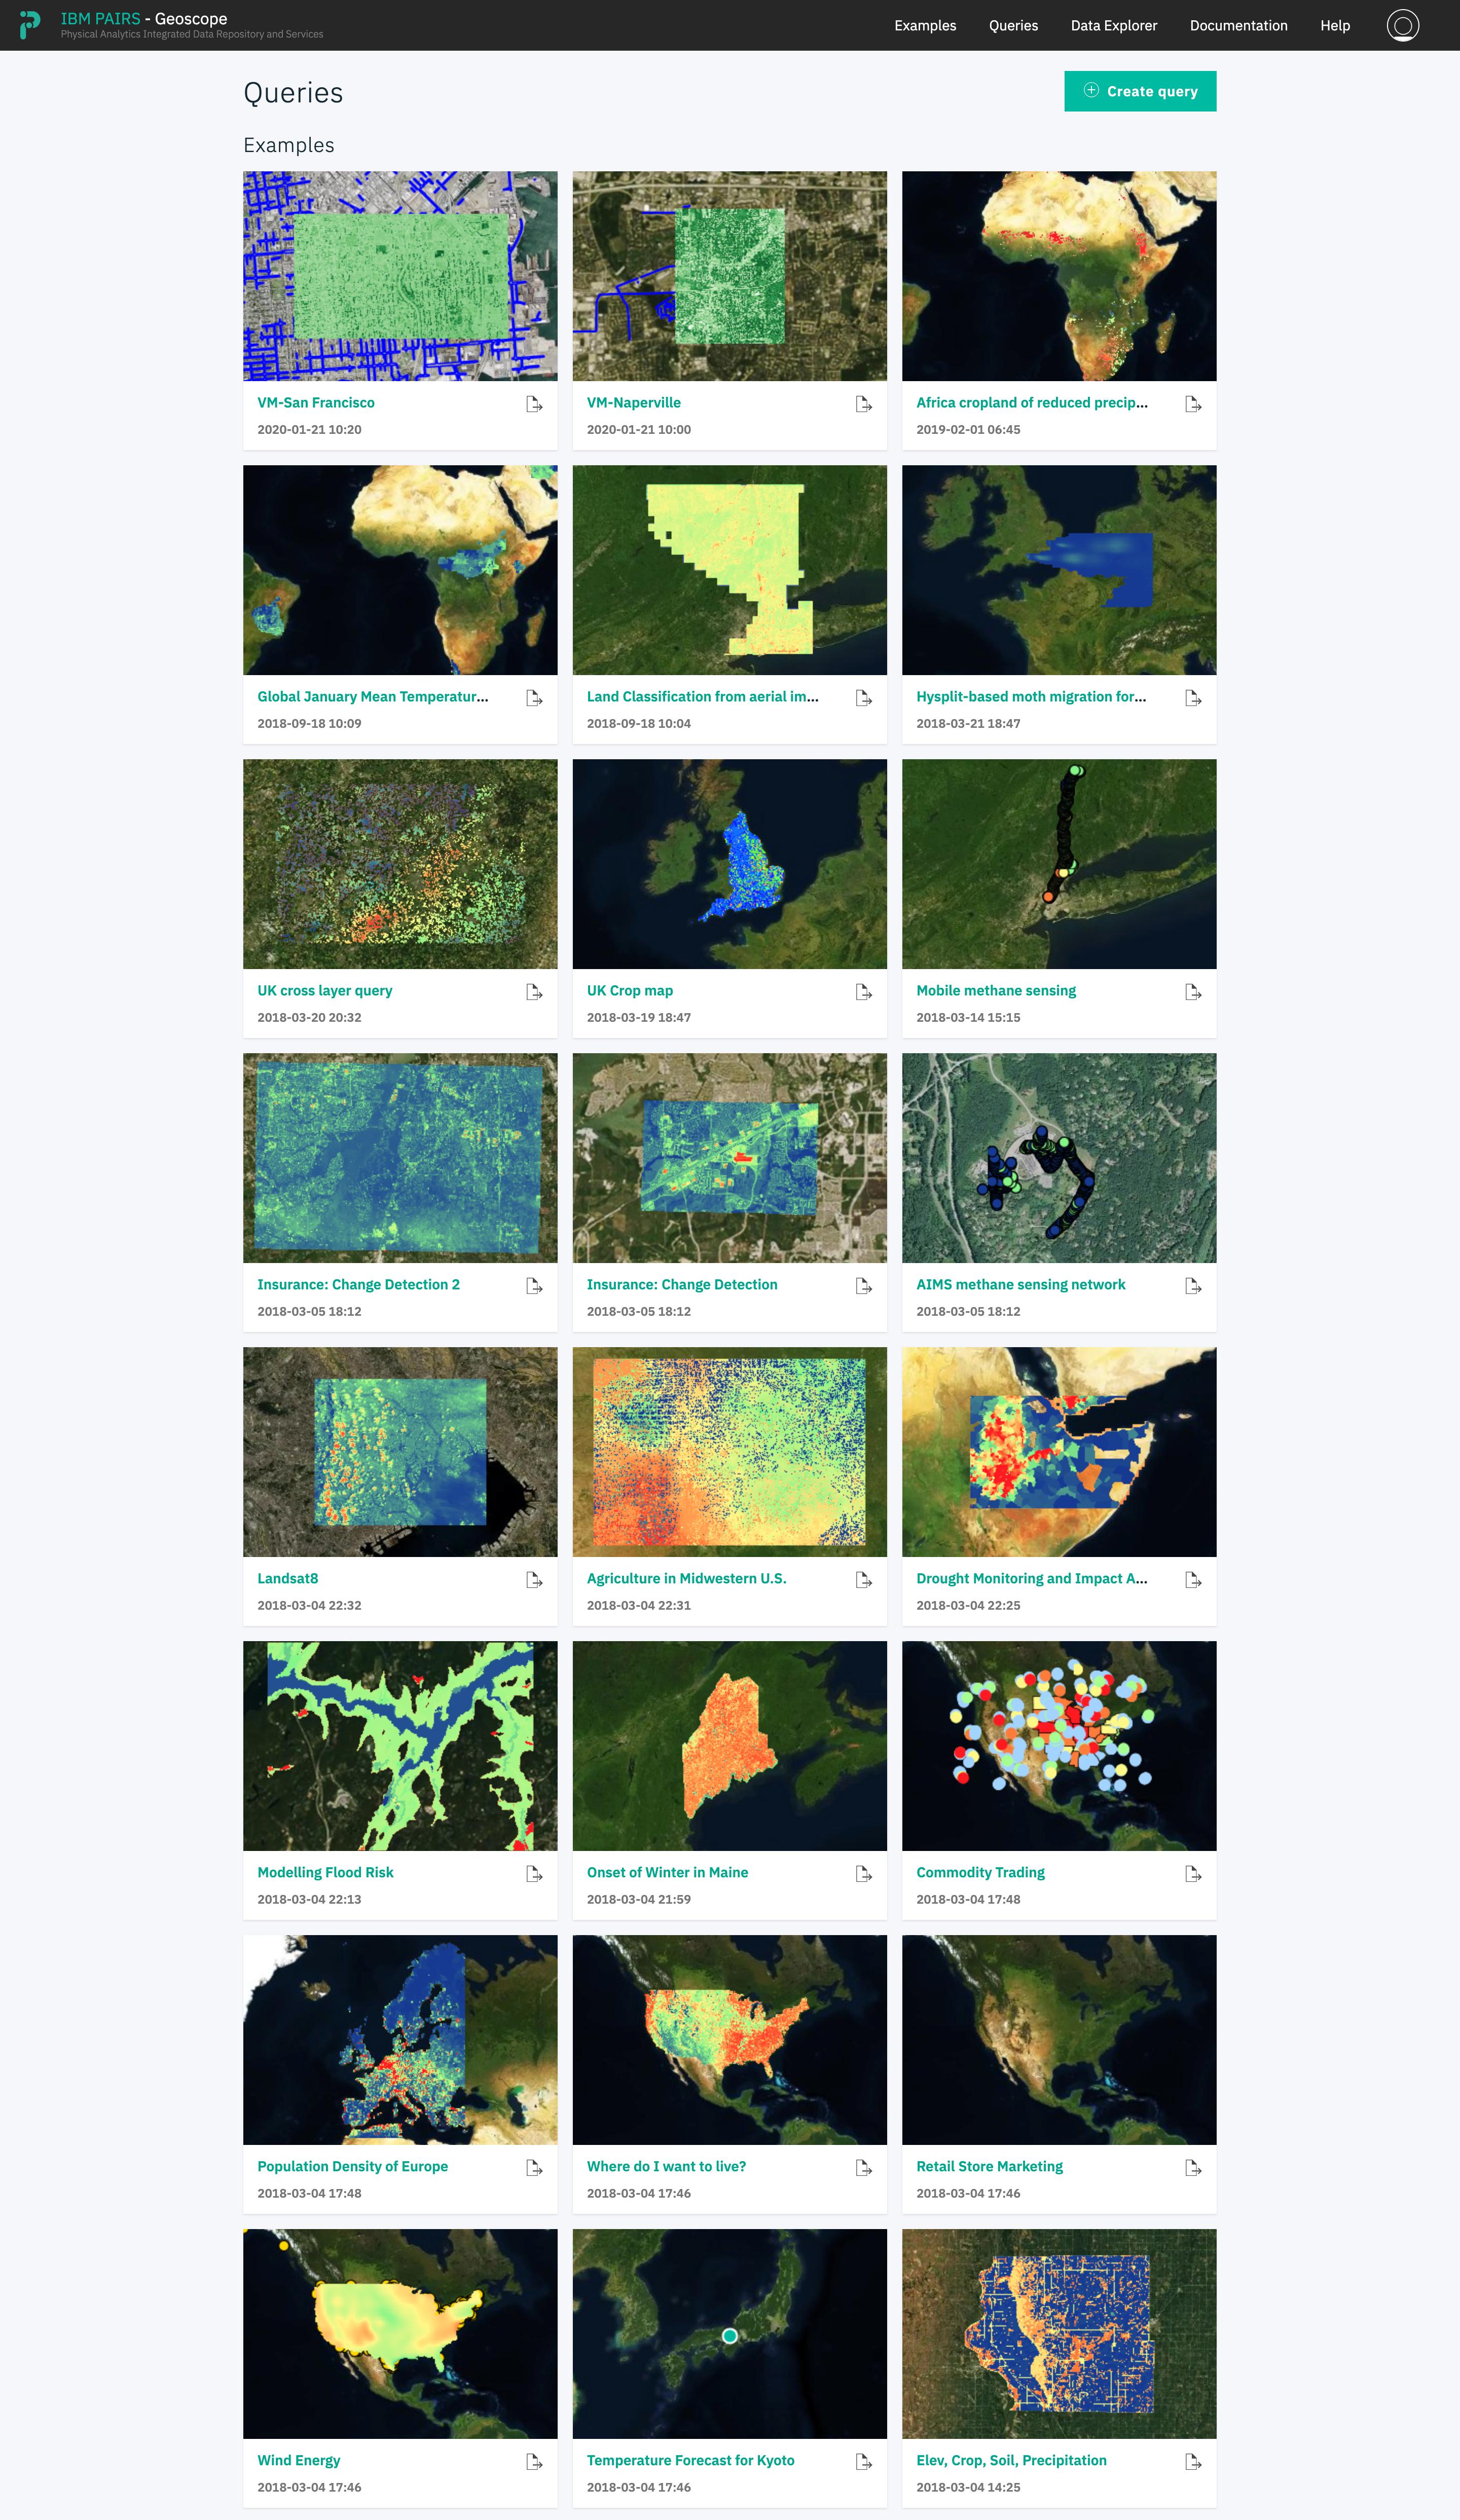 screencapture-ibmpairs-mybluemix-net-queries-2020-02-26-12_03_40